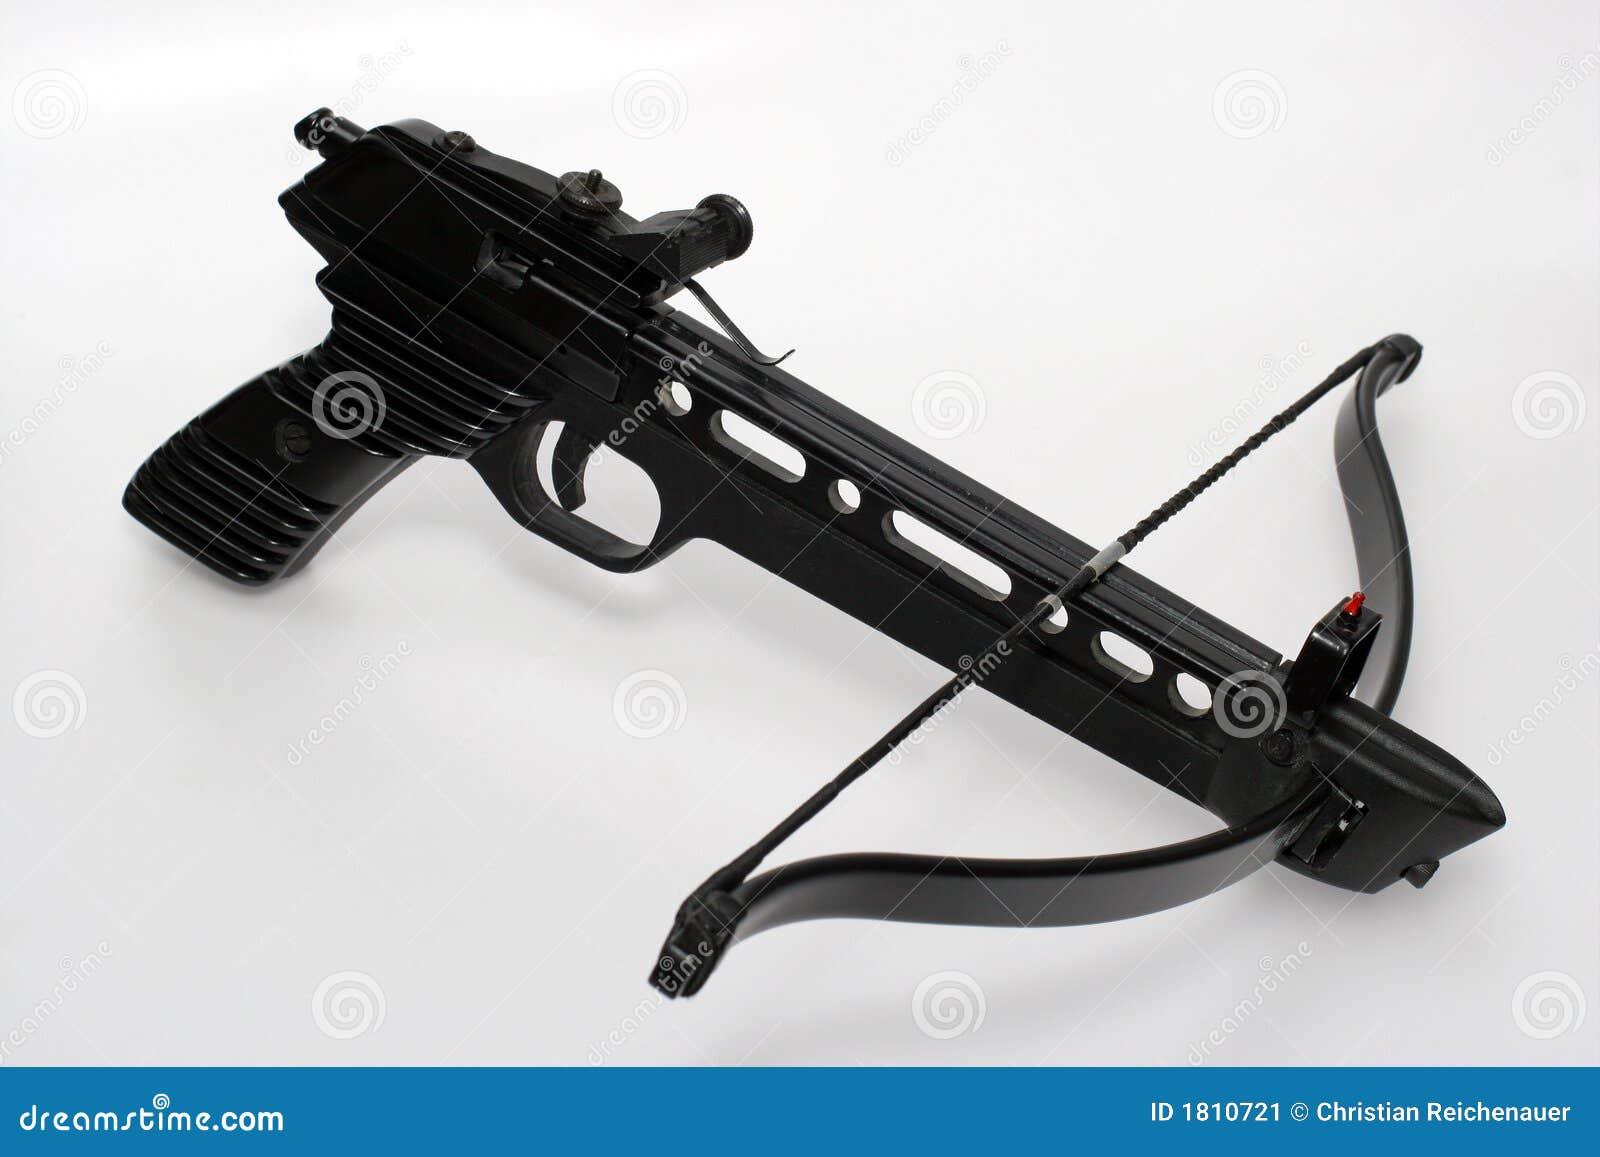 Crossbow handgun